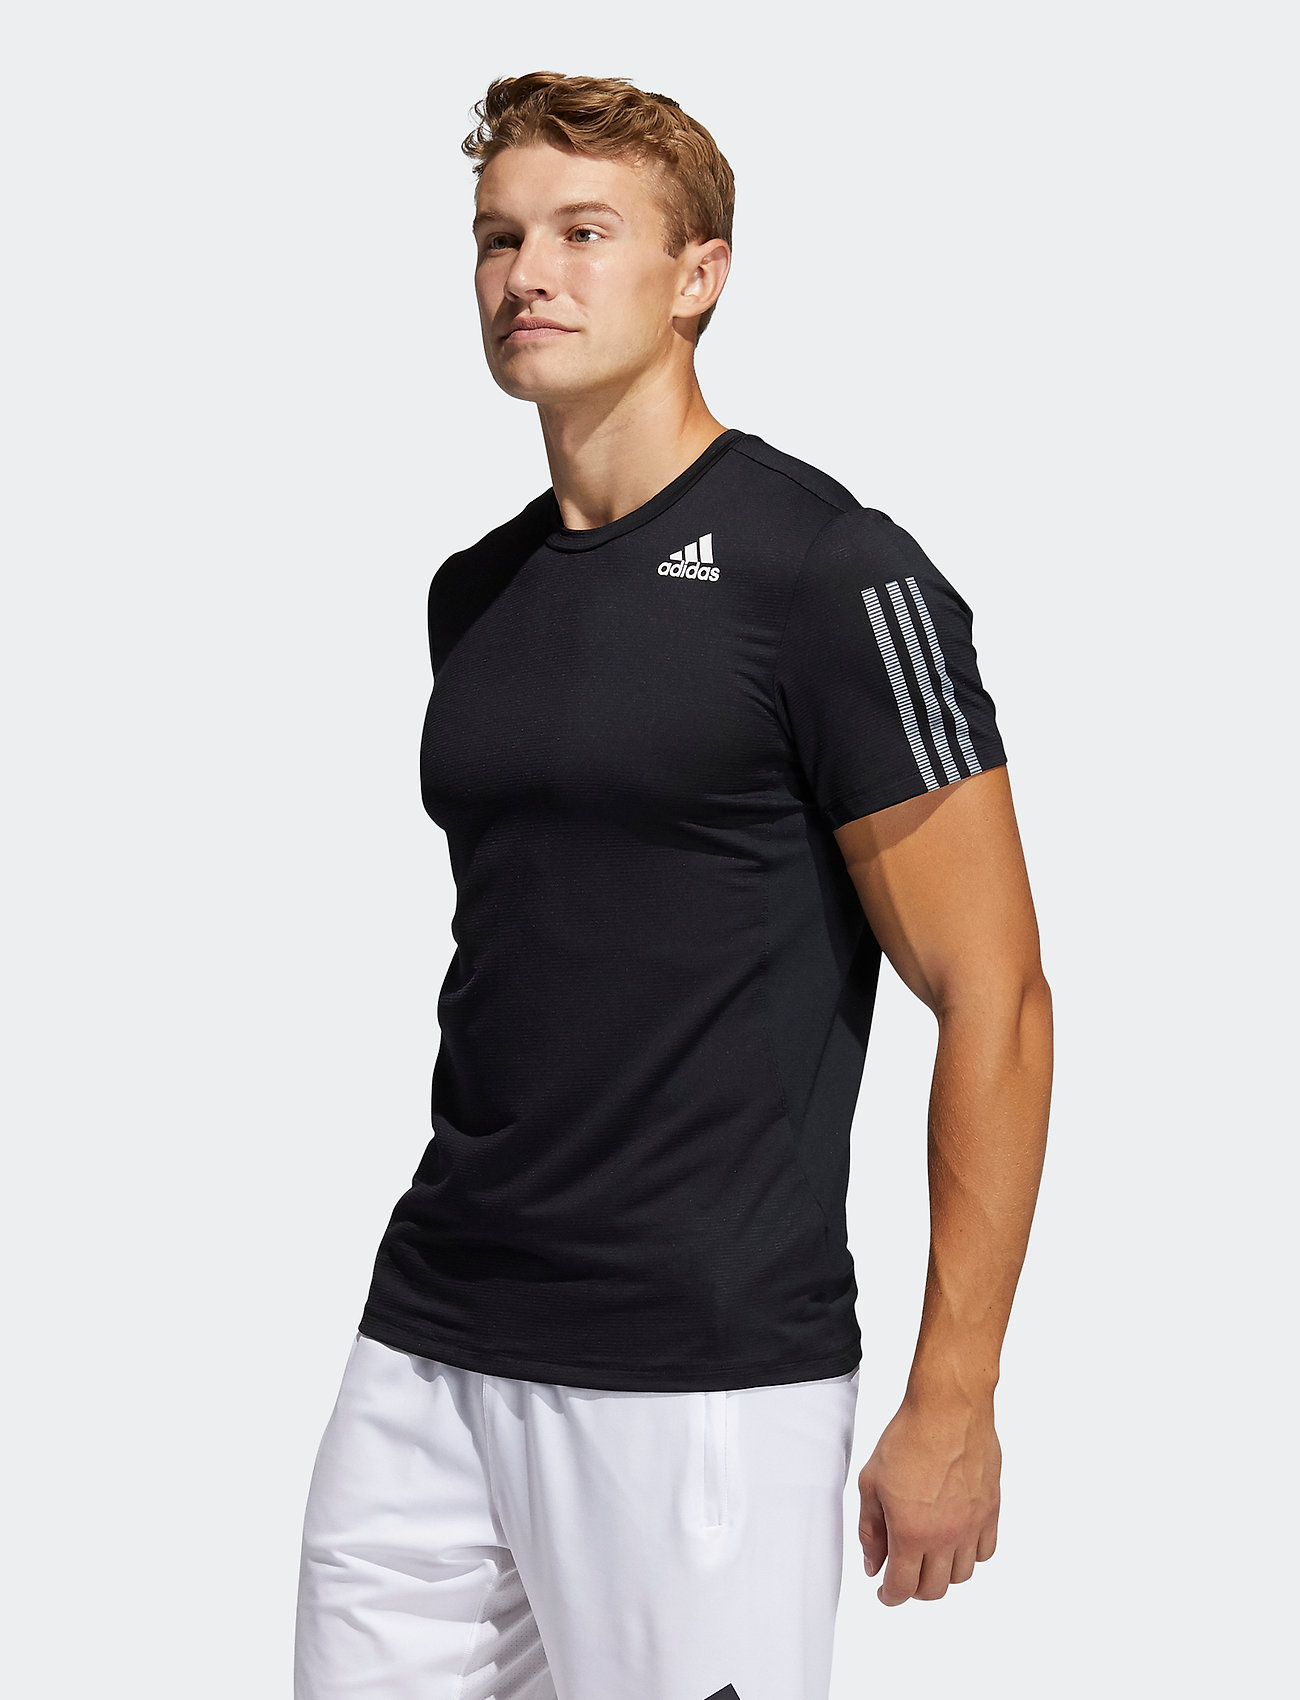 adidas Performance - Primeblue AEROREADY 3-Stripes Slim T-Shirt - oberteile & t-shirts - black - 0